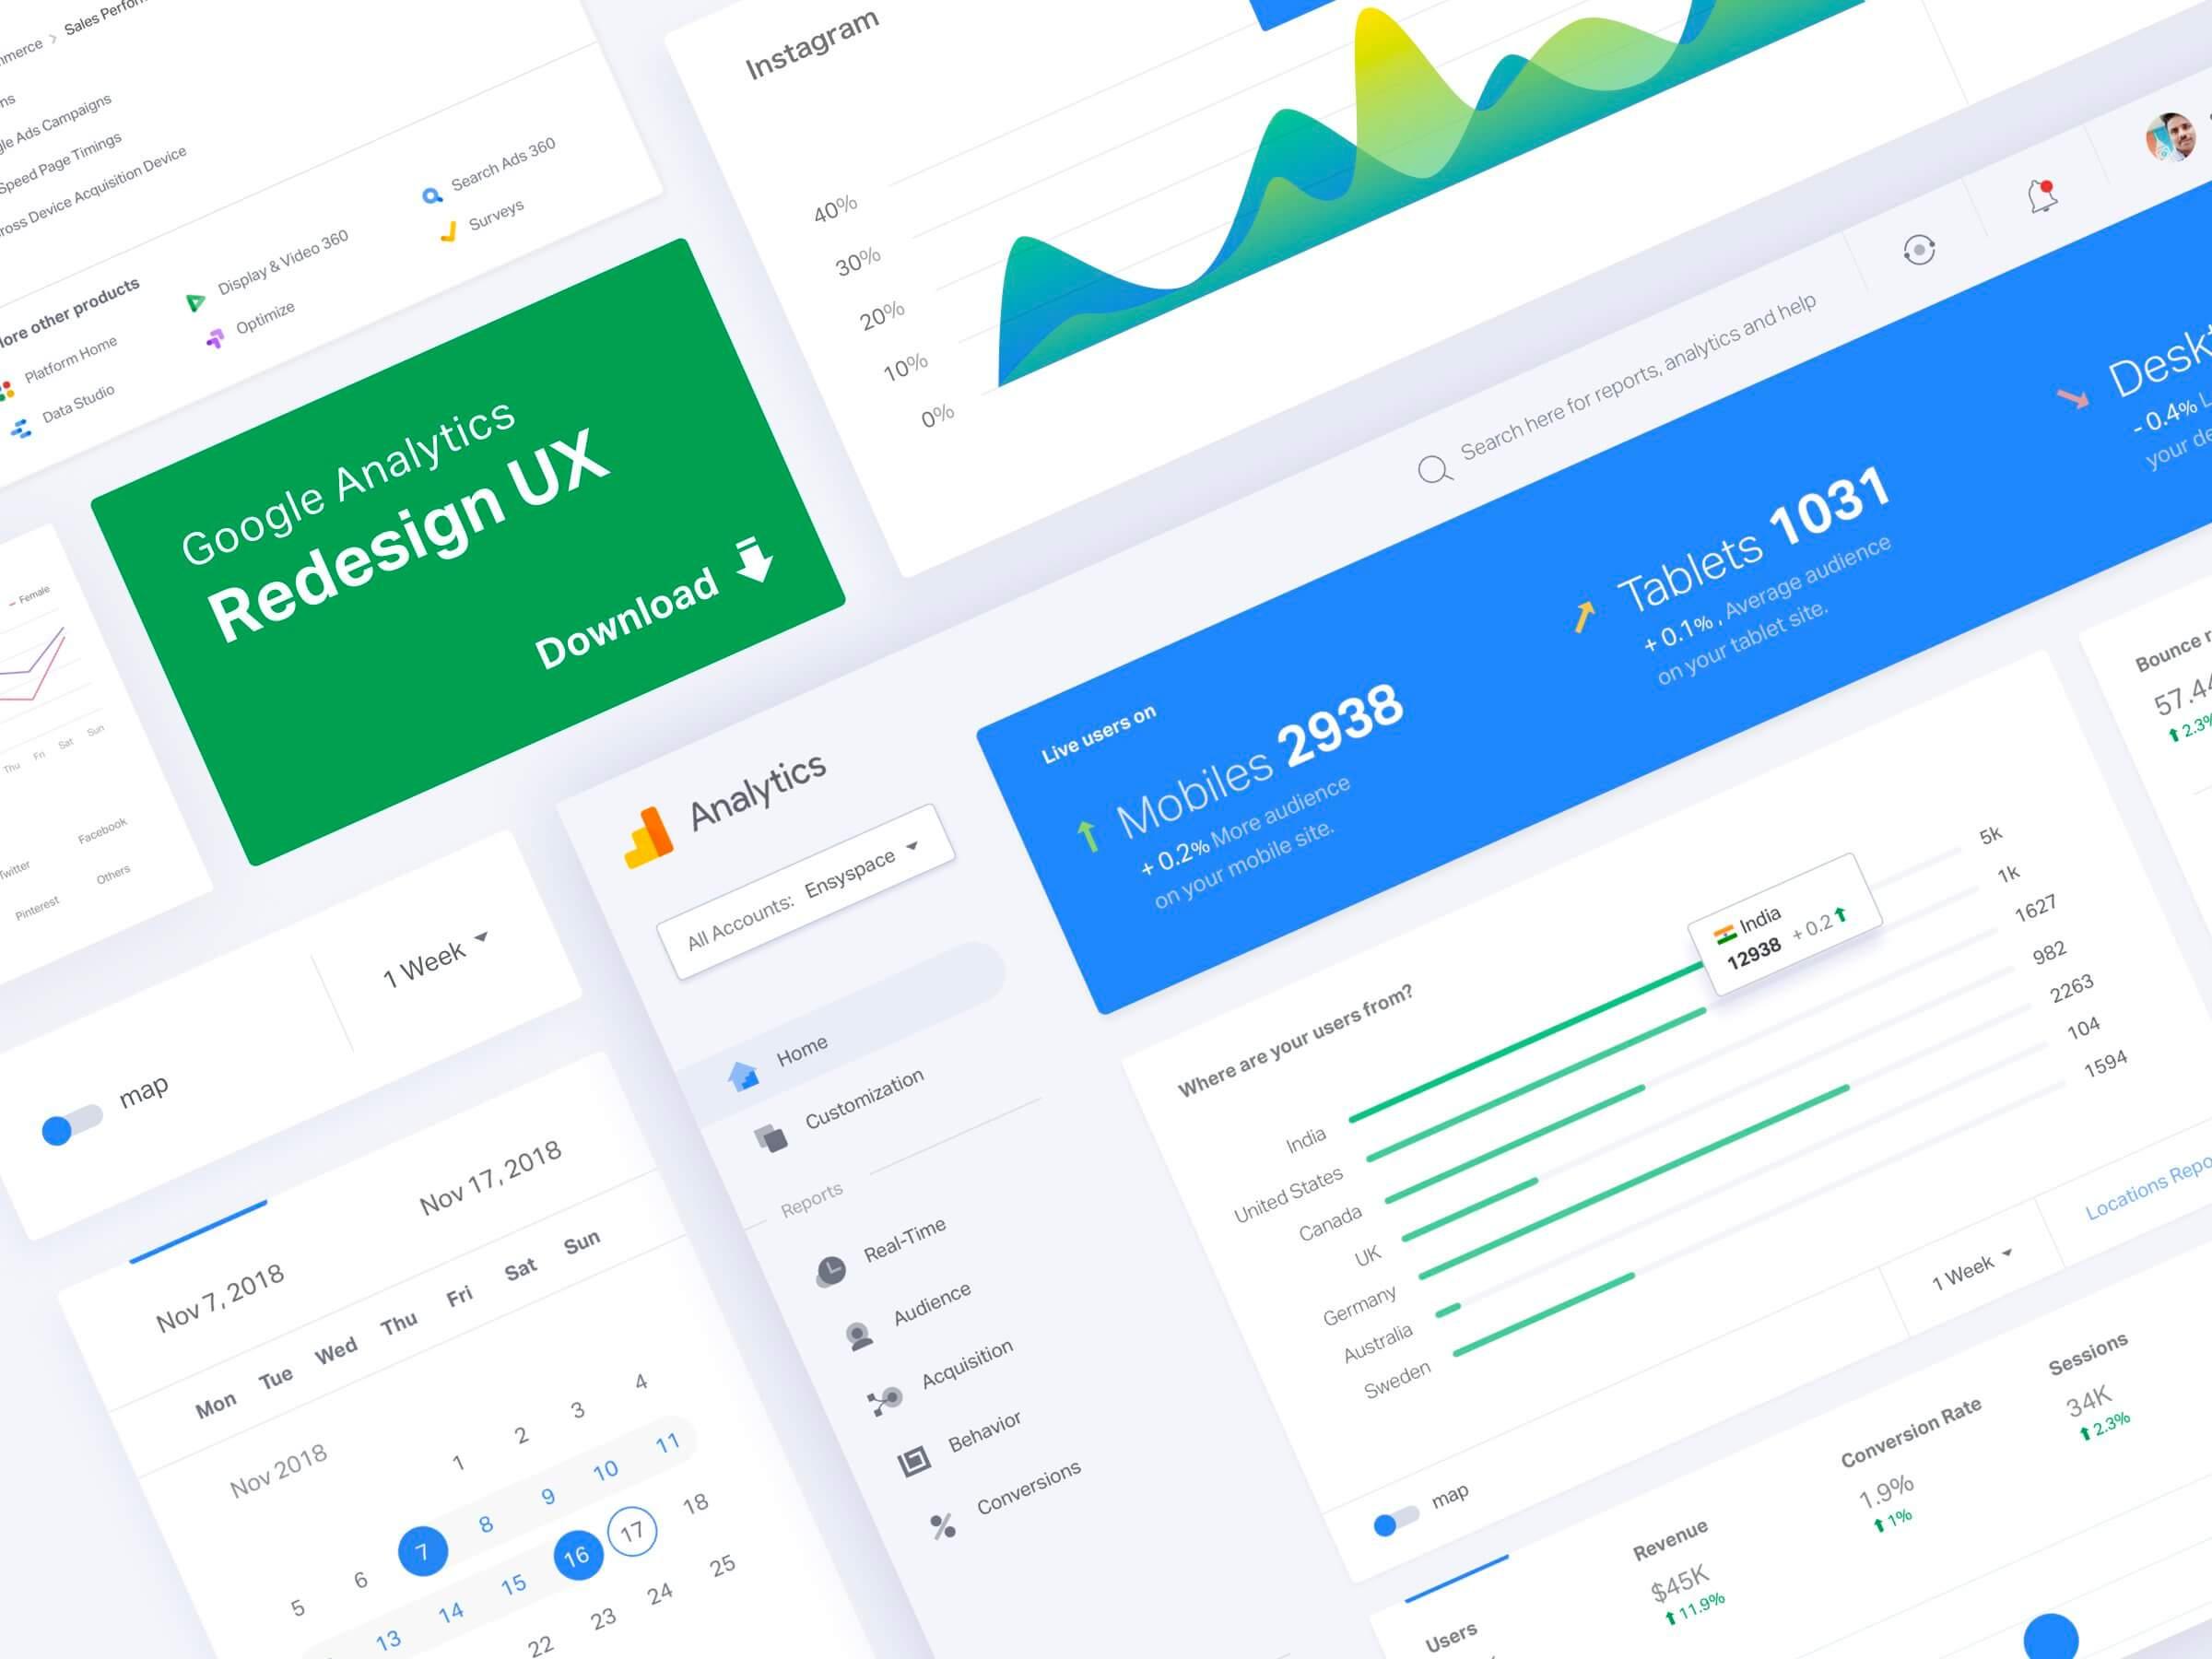 Google Analytics Redesign cover image